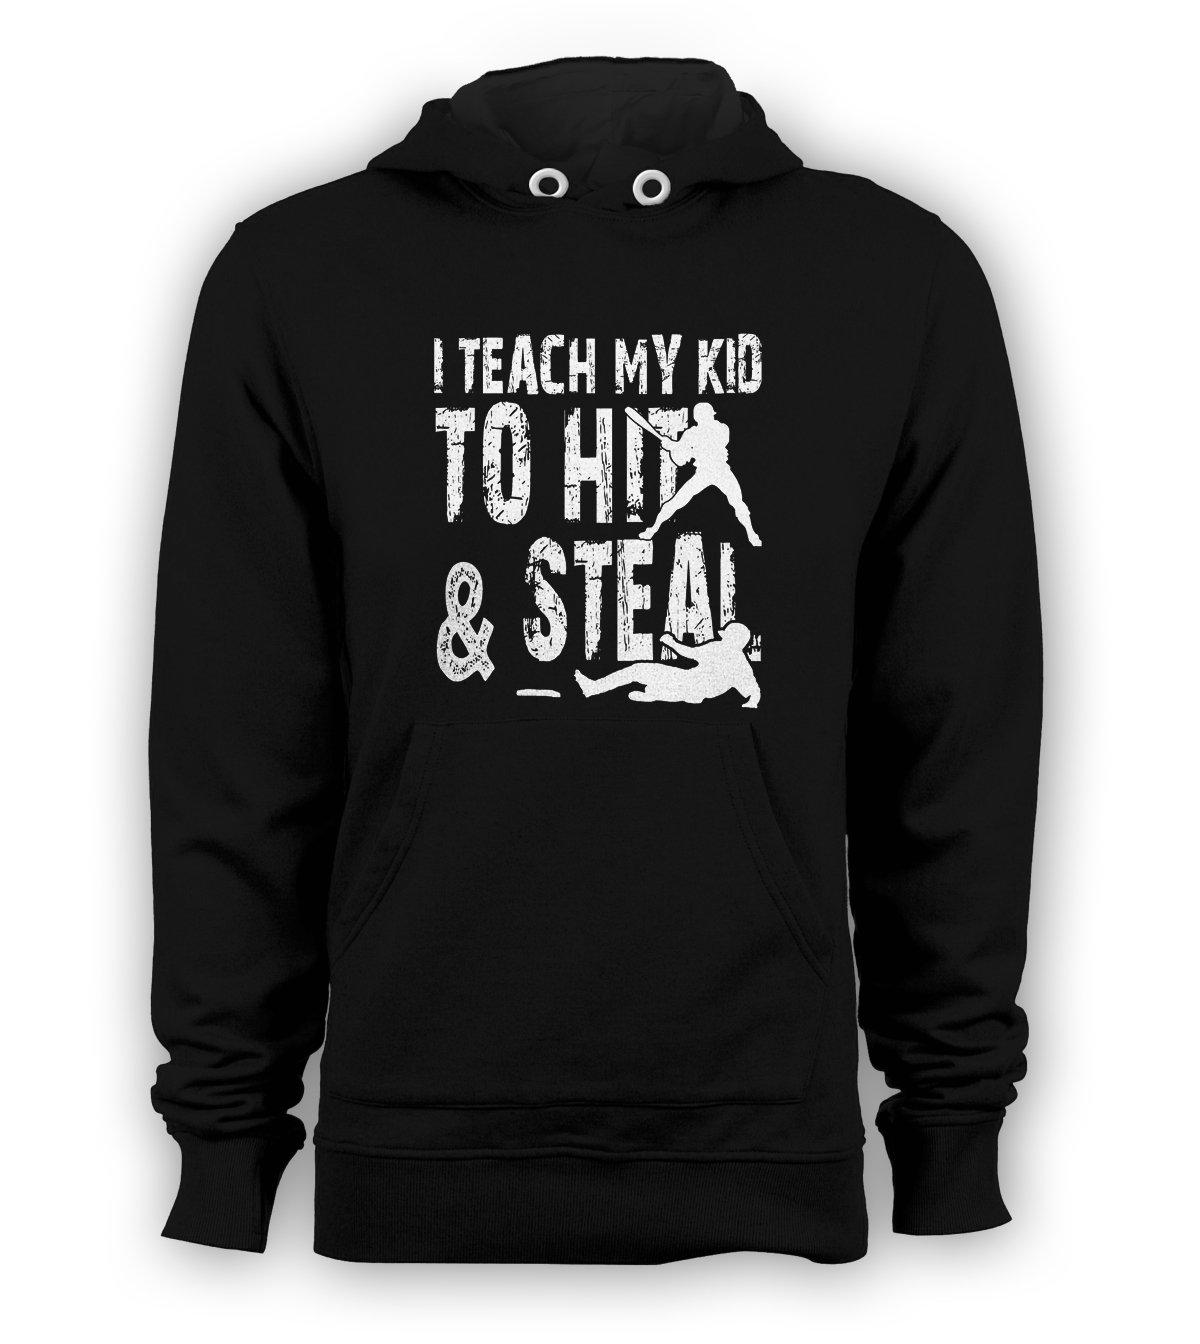 I Teach My Kid To Hit & Steal Pullover Hoodie Baseball Men Sweatshirts Black New